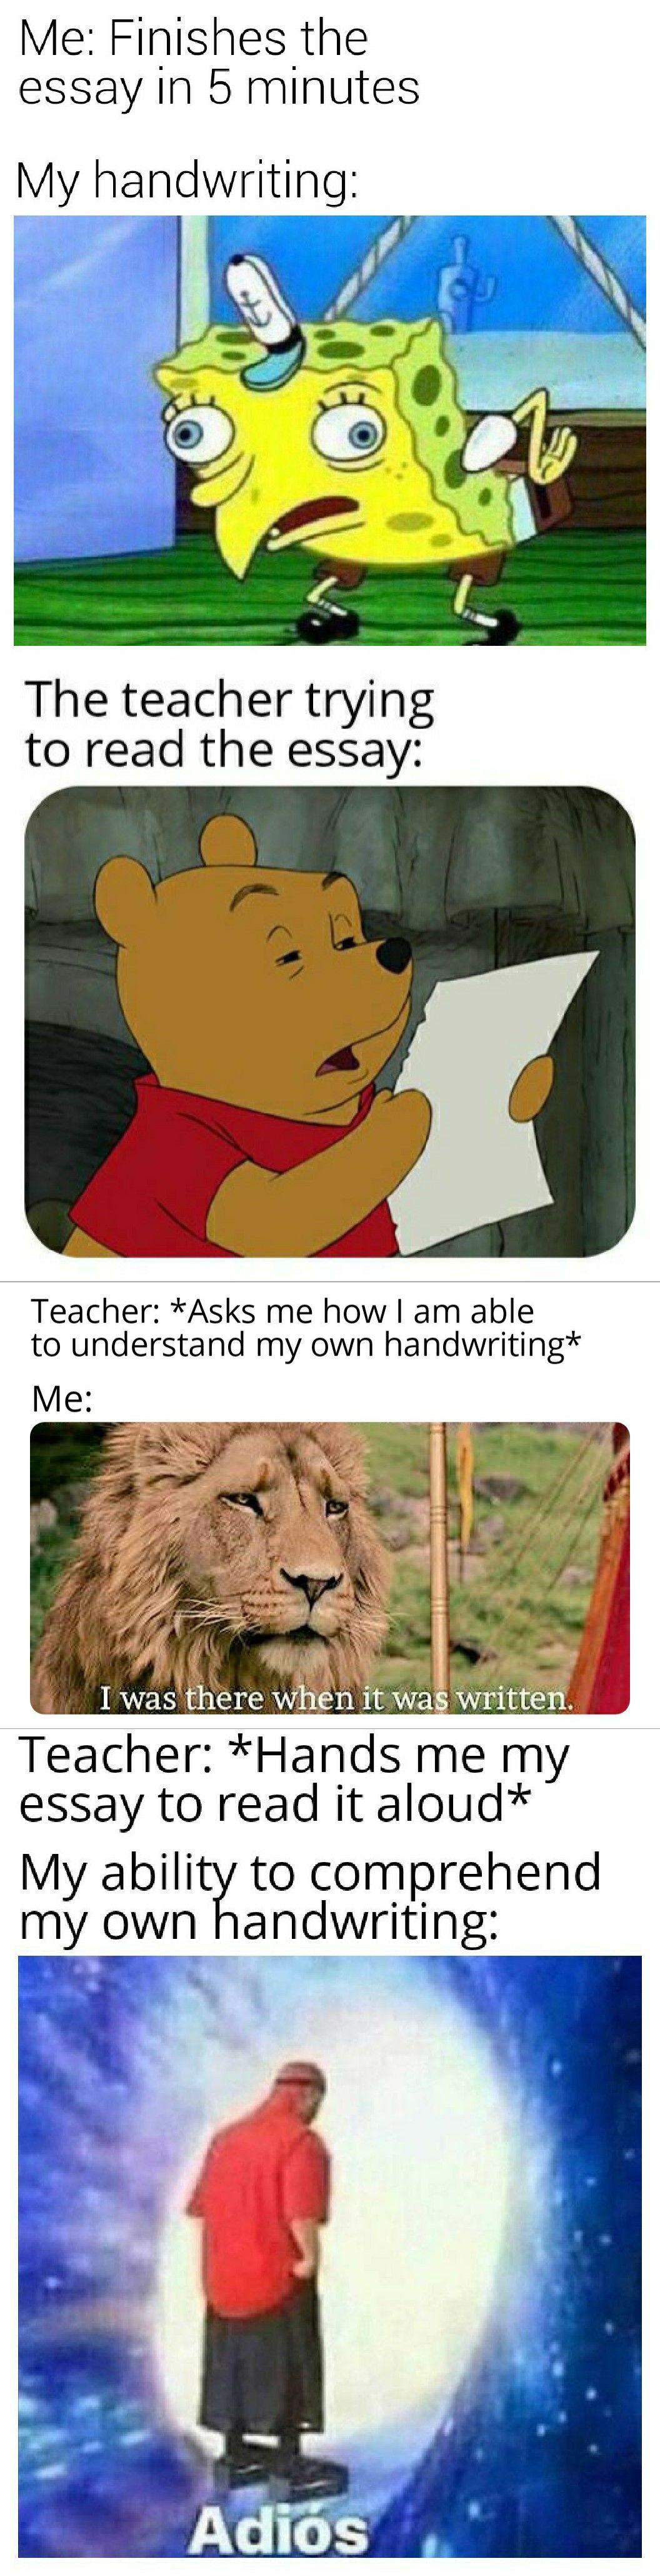 Epic Crossover Meme Really Funny Memes Funny Kid Memes Funny Relatable Memes